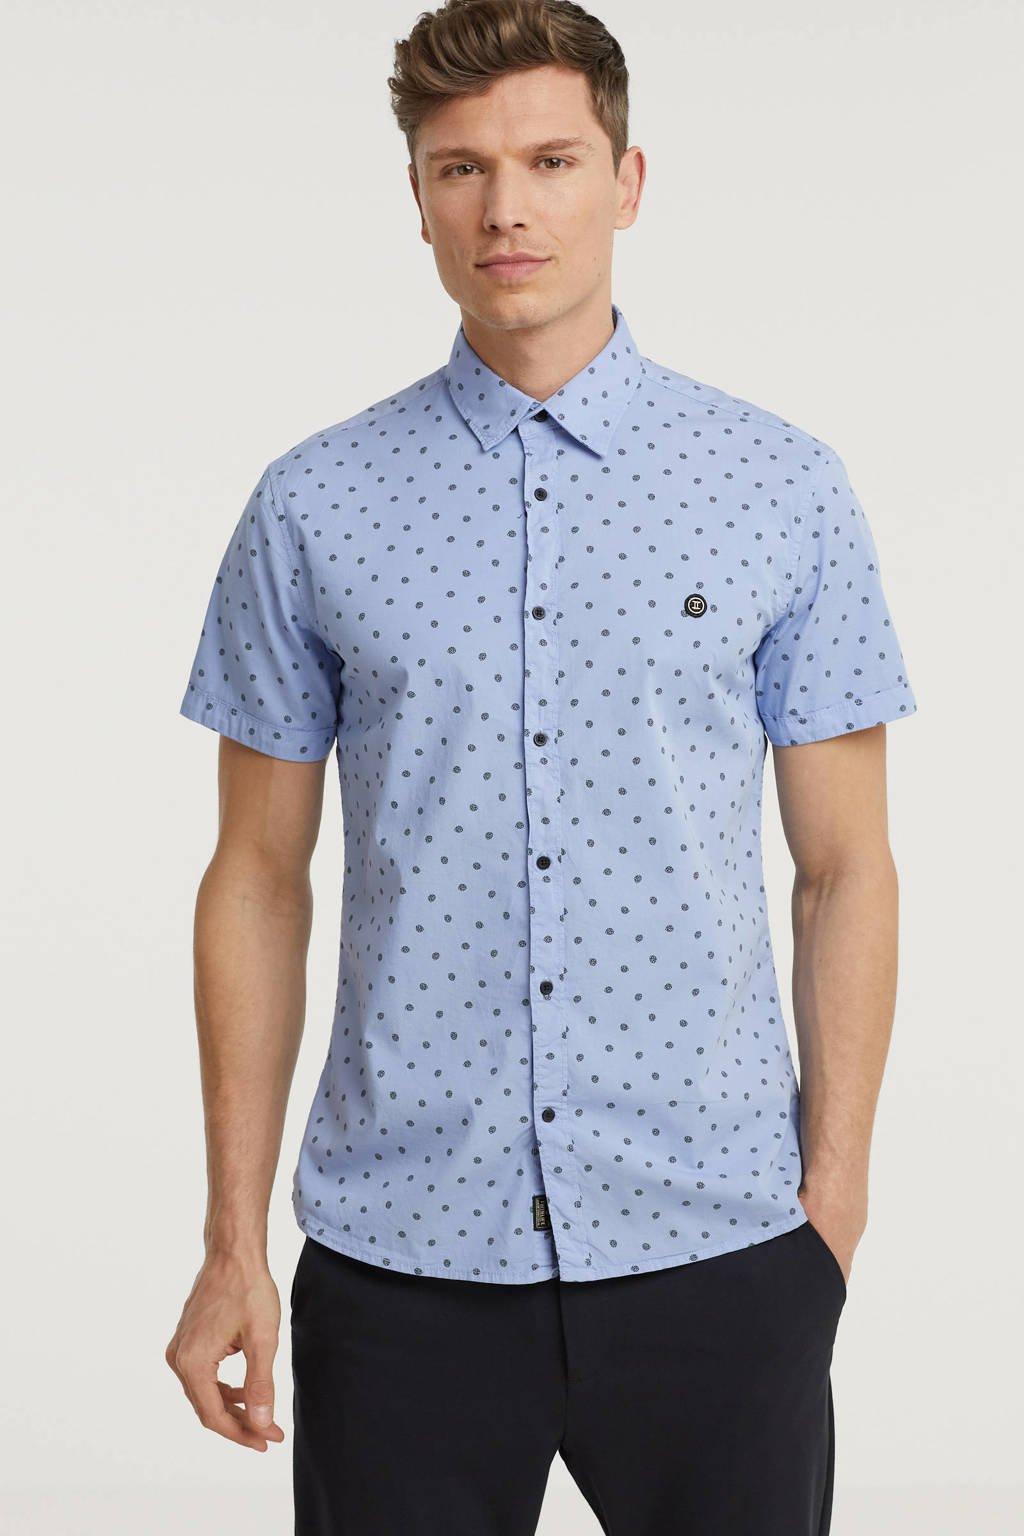 Twinlife regular fit overhemd met all over print serenity, Serenity